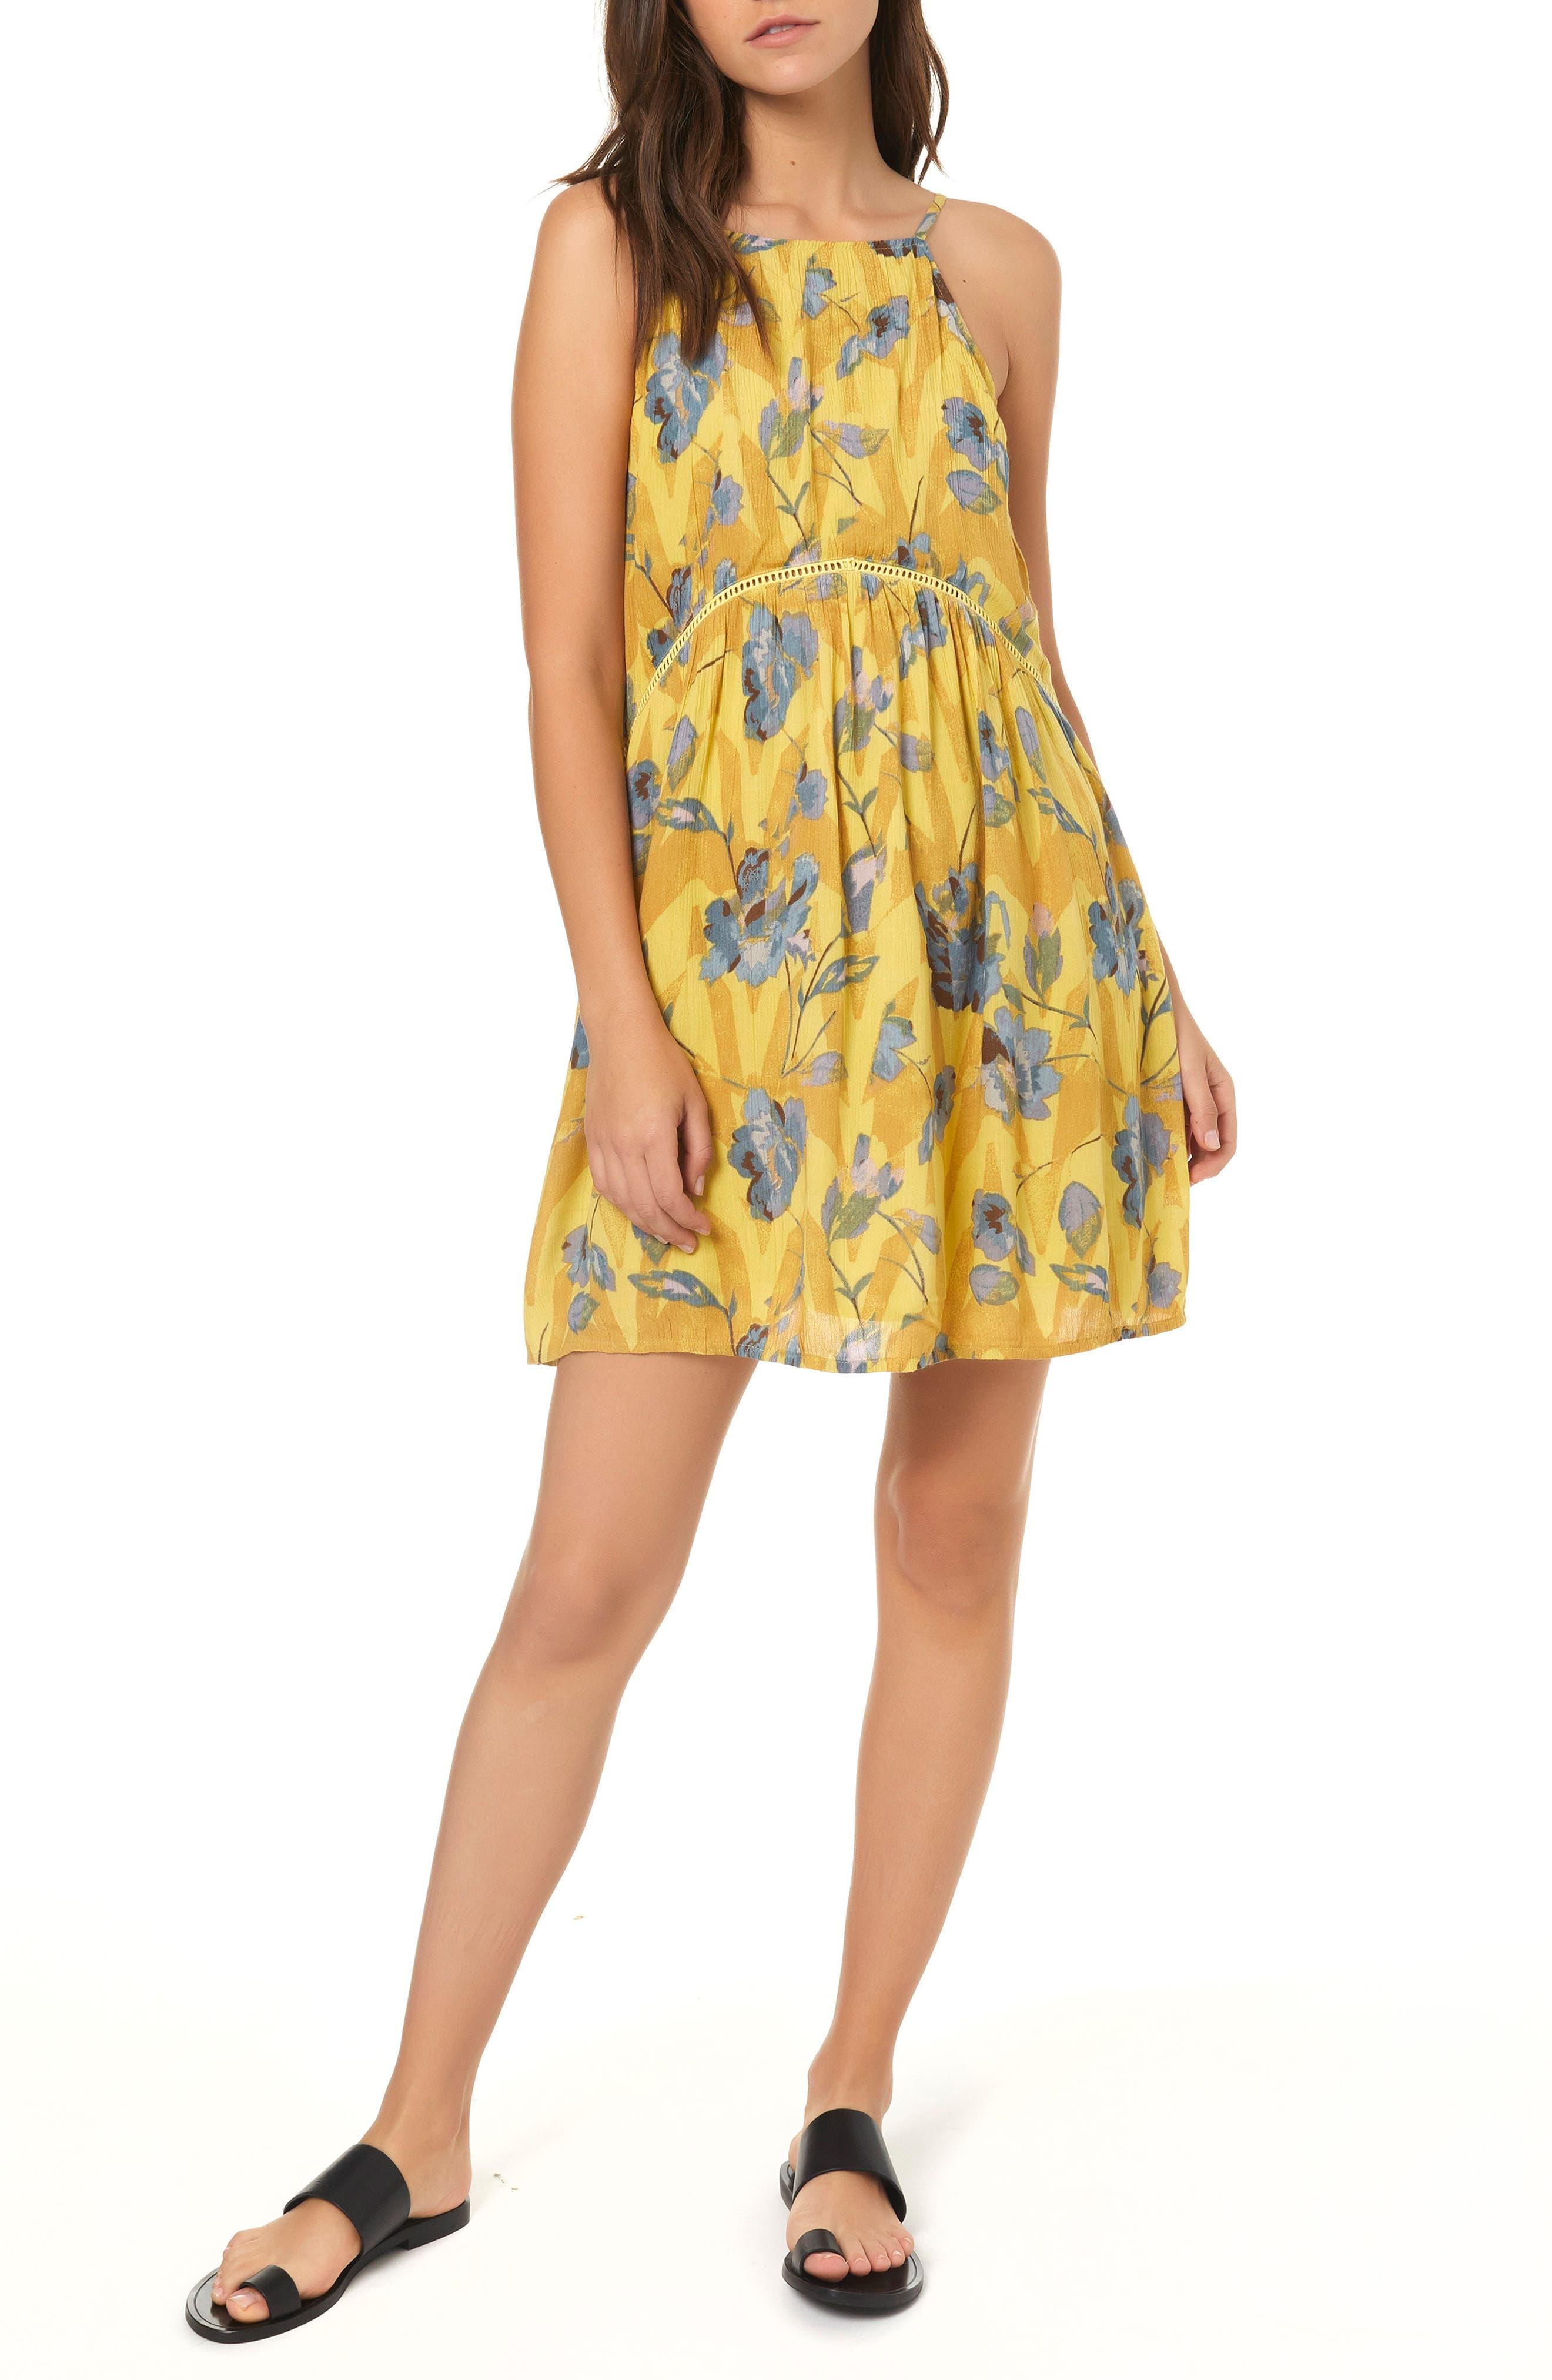 Henna Floral Print Woven Tank Dress,                             Main thumbnail 1, color,                             MULTI COLORED